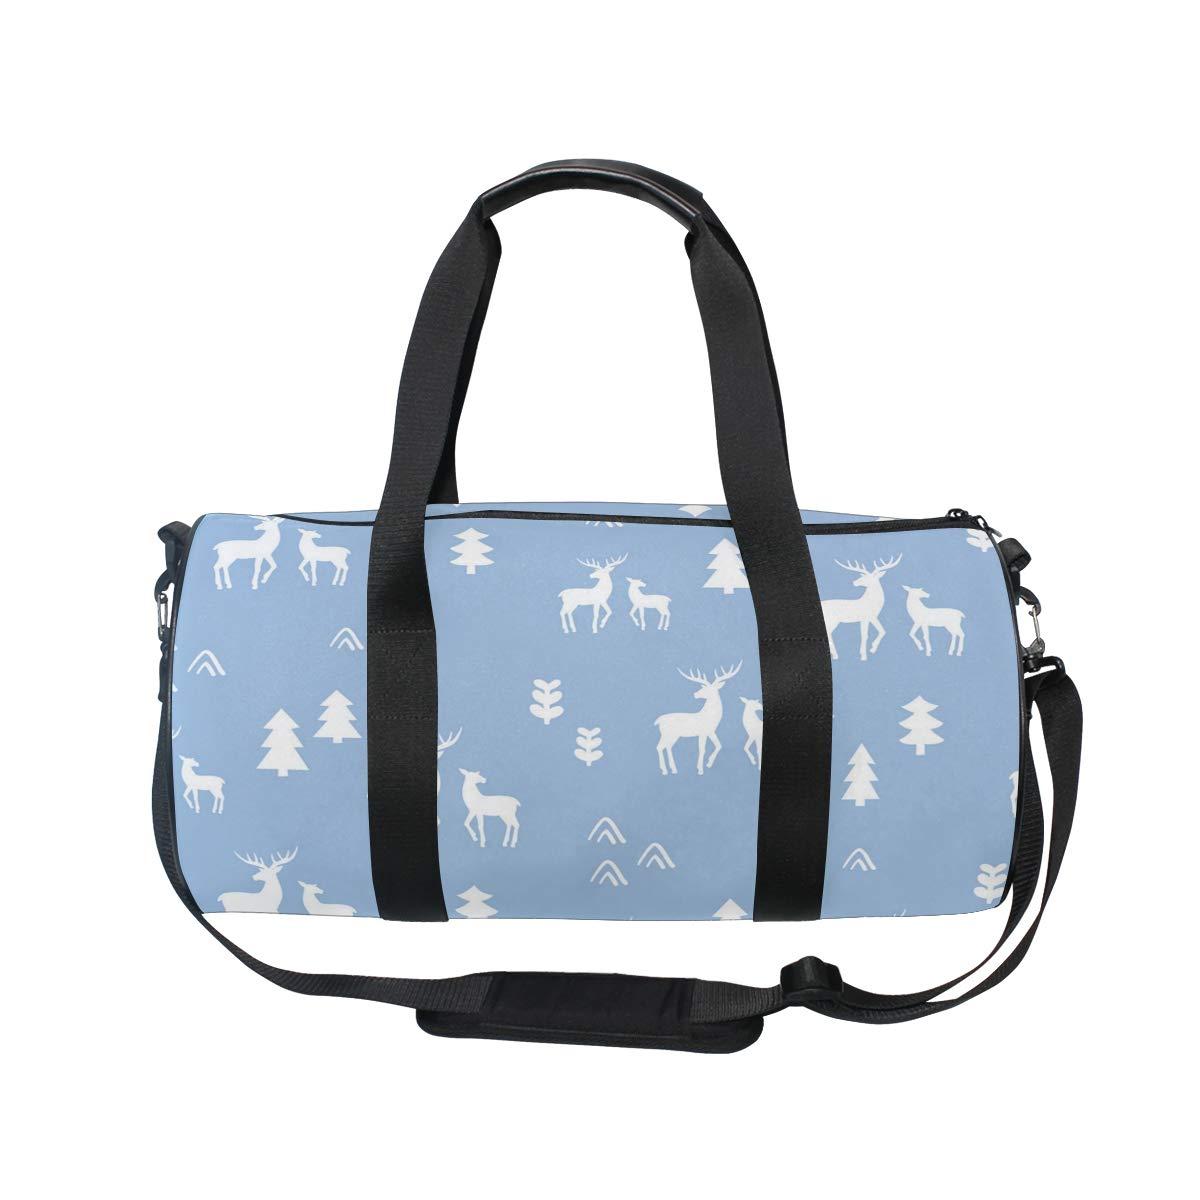 Waterproof Shoulder Bag. Led Outdoor Christmas Tree Popular casual fitness bag,Non-Slip Wearable Crossbody Bag